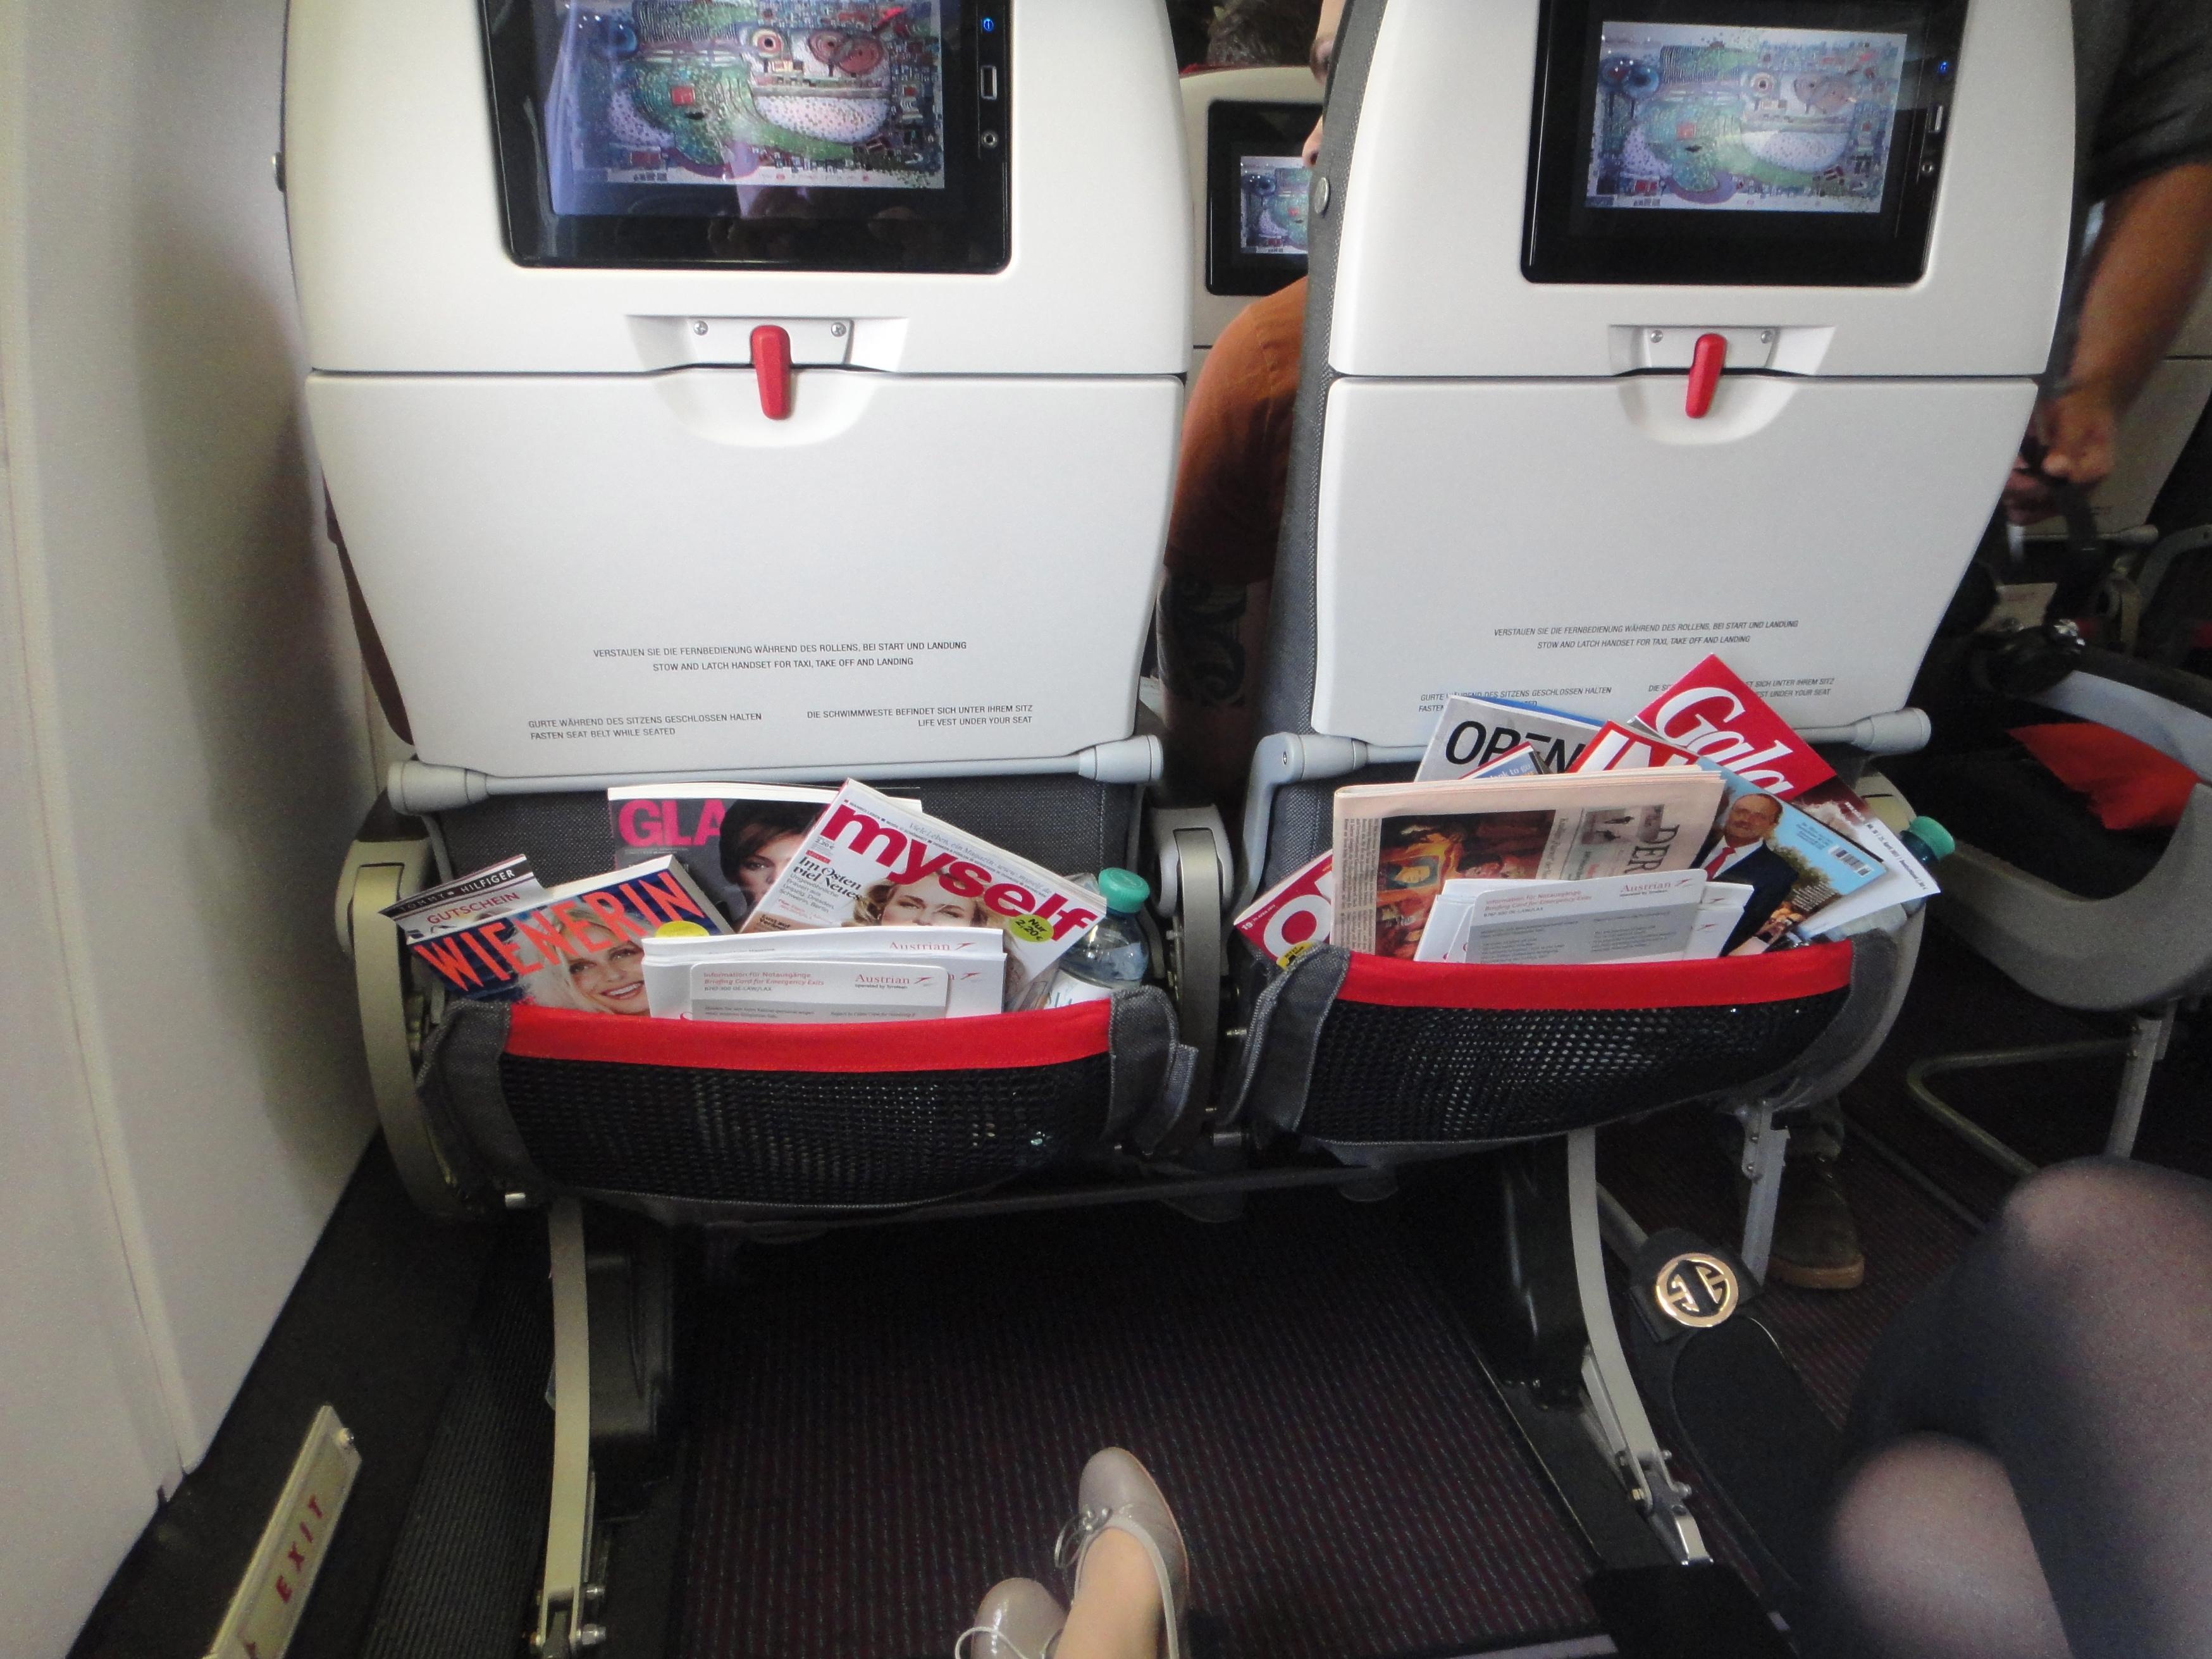 masses of space - Austrian Airlines emergency exit seats Endlos Platz - Sitze am Notausgang in der AUA